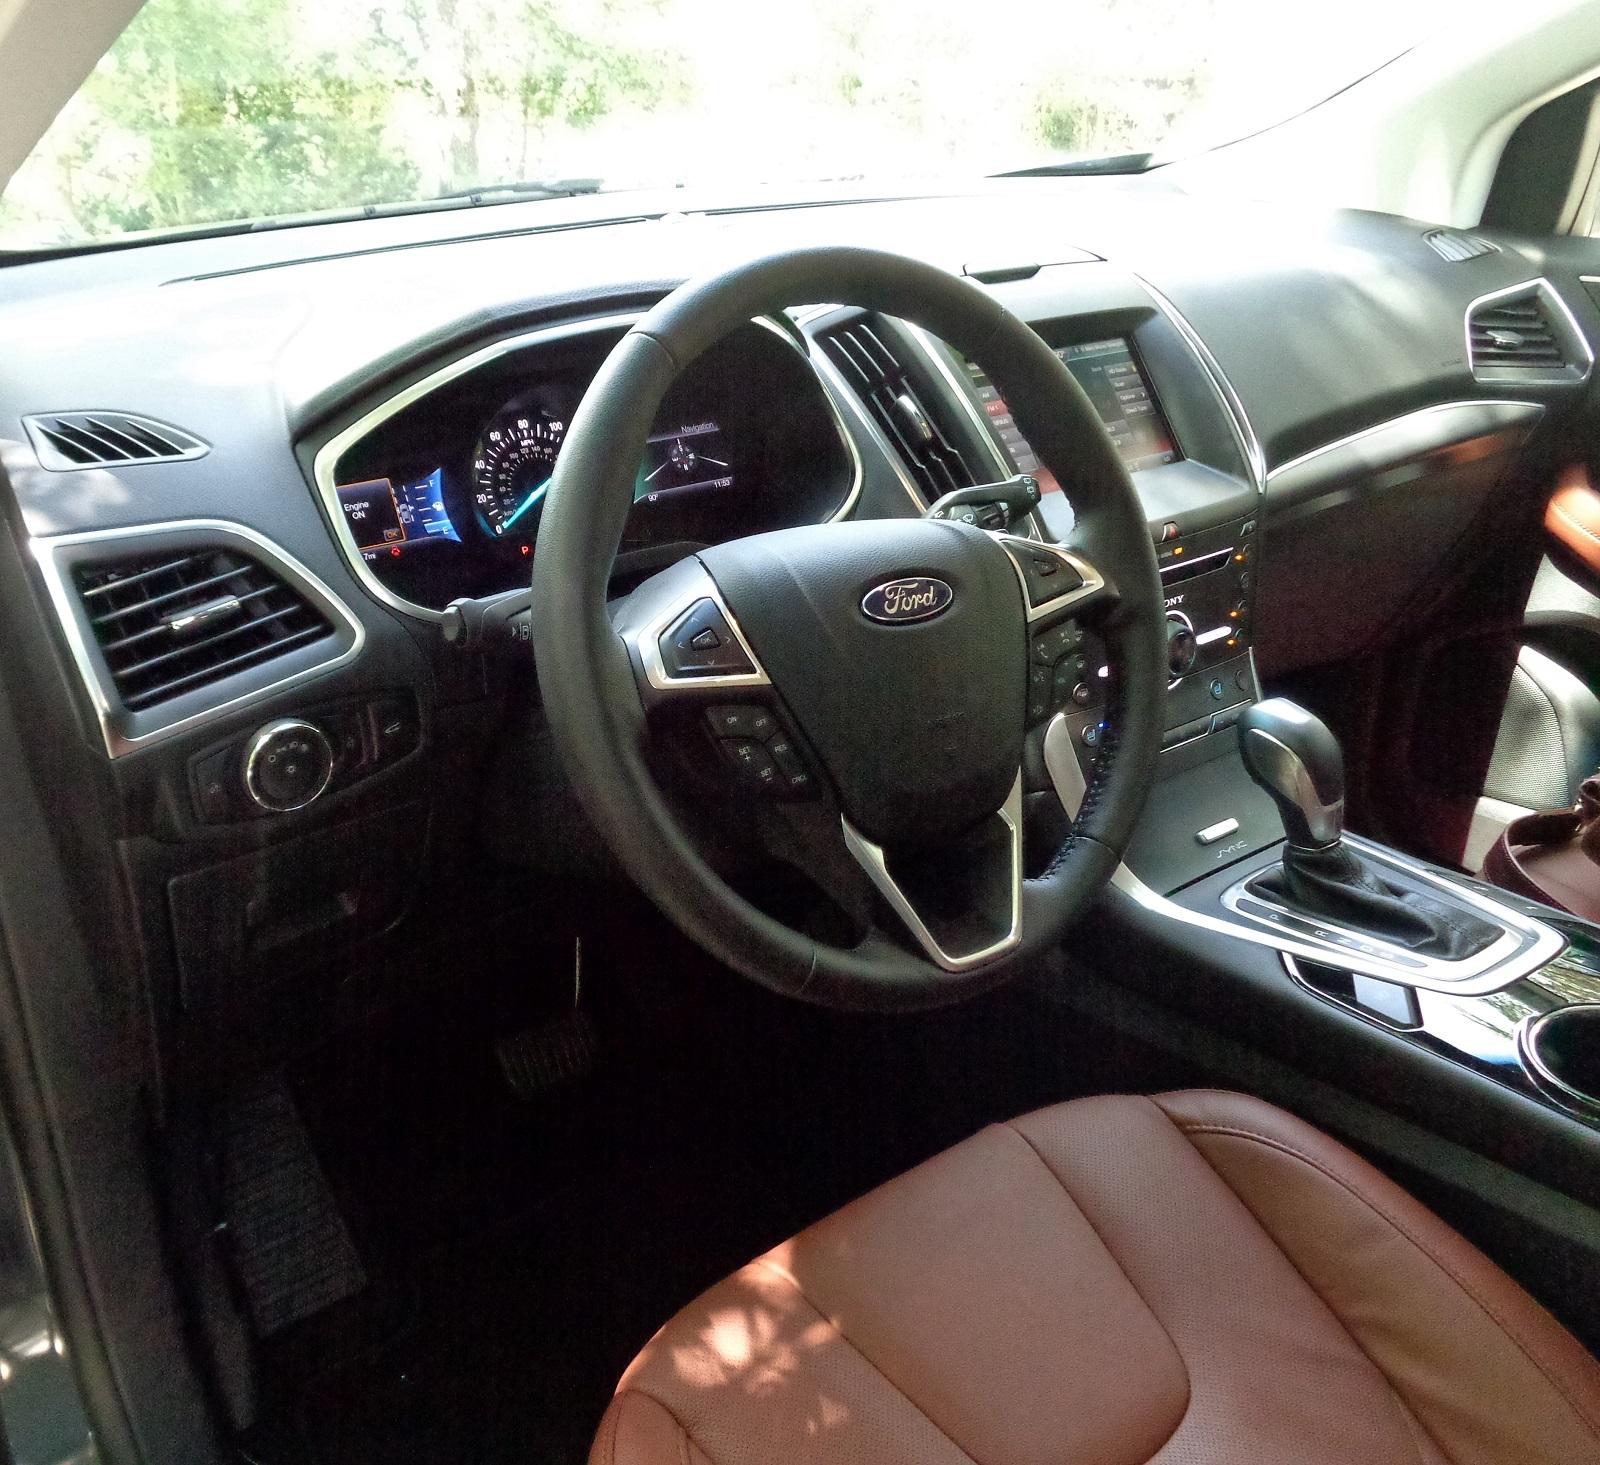 Ford Edge Titanium Awd Is One Sharp Ride